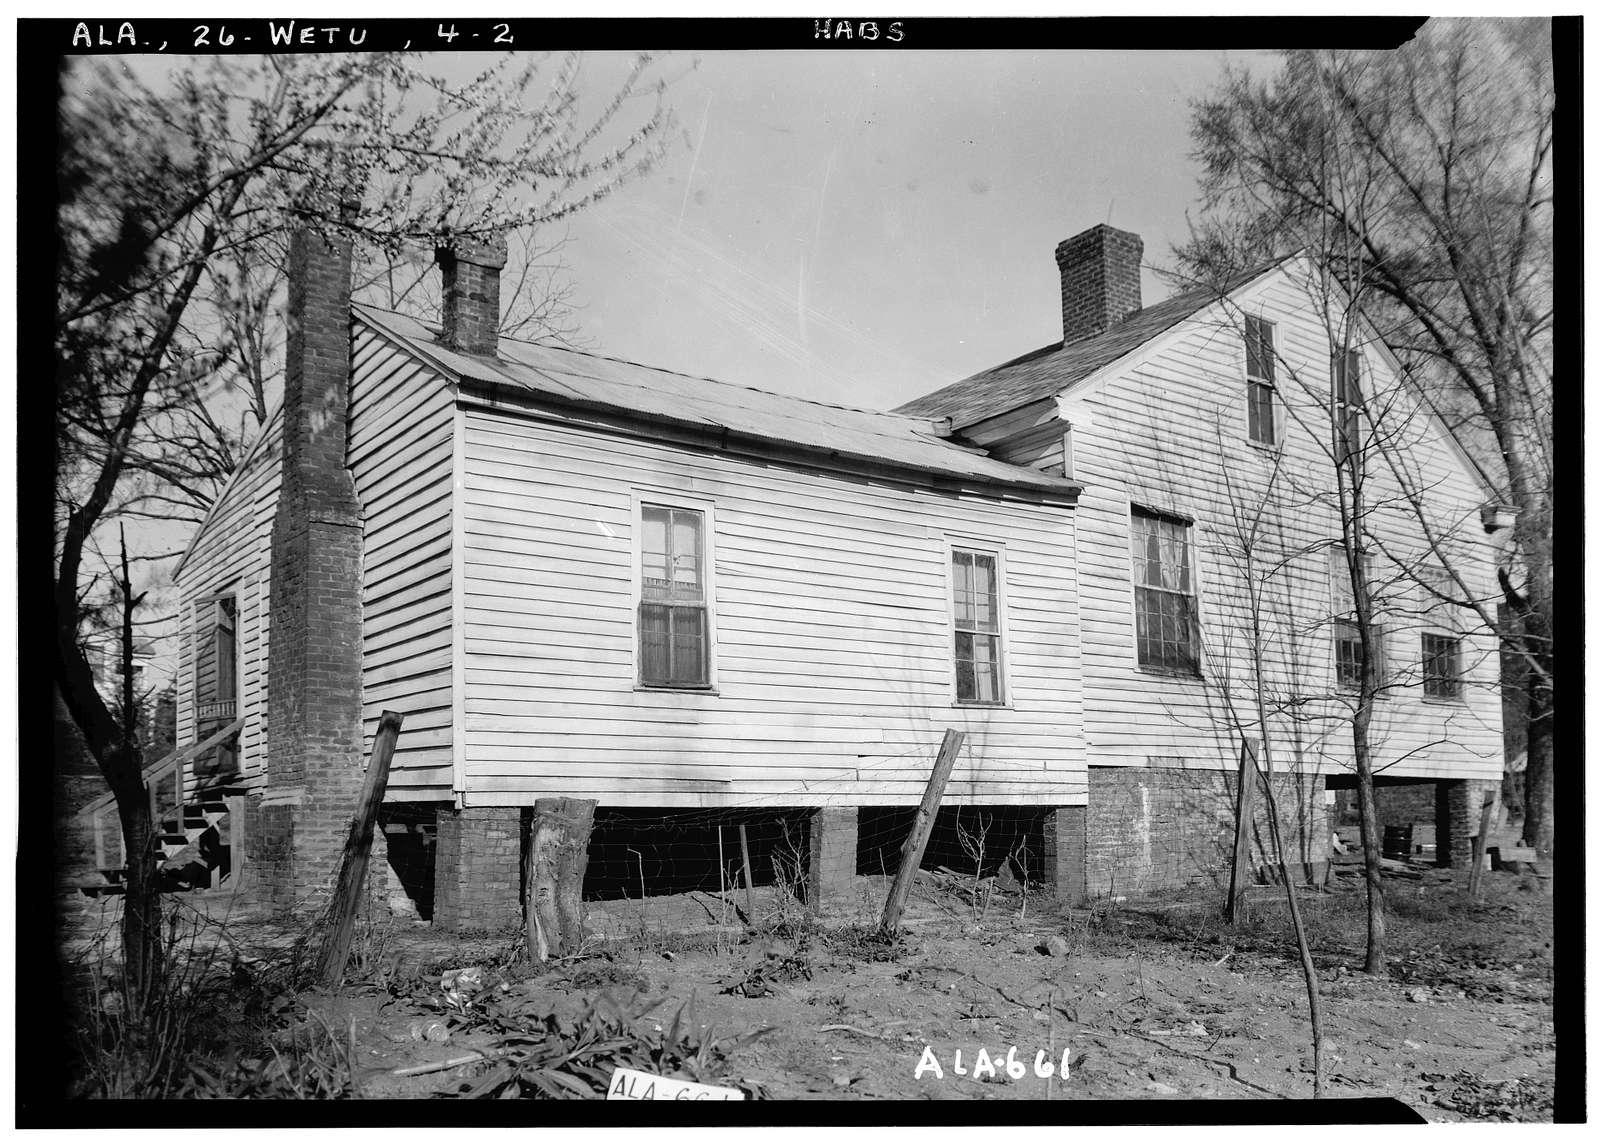 E. L. Smoot House, 705 Mansion Street, Wetumpka, Elmore County, AL